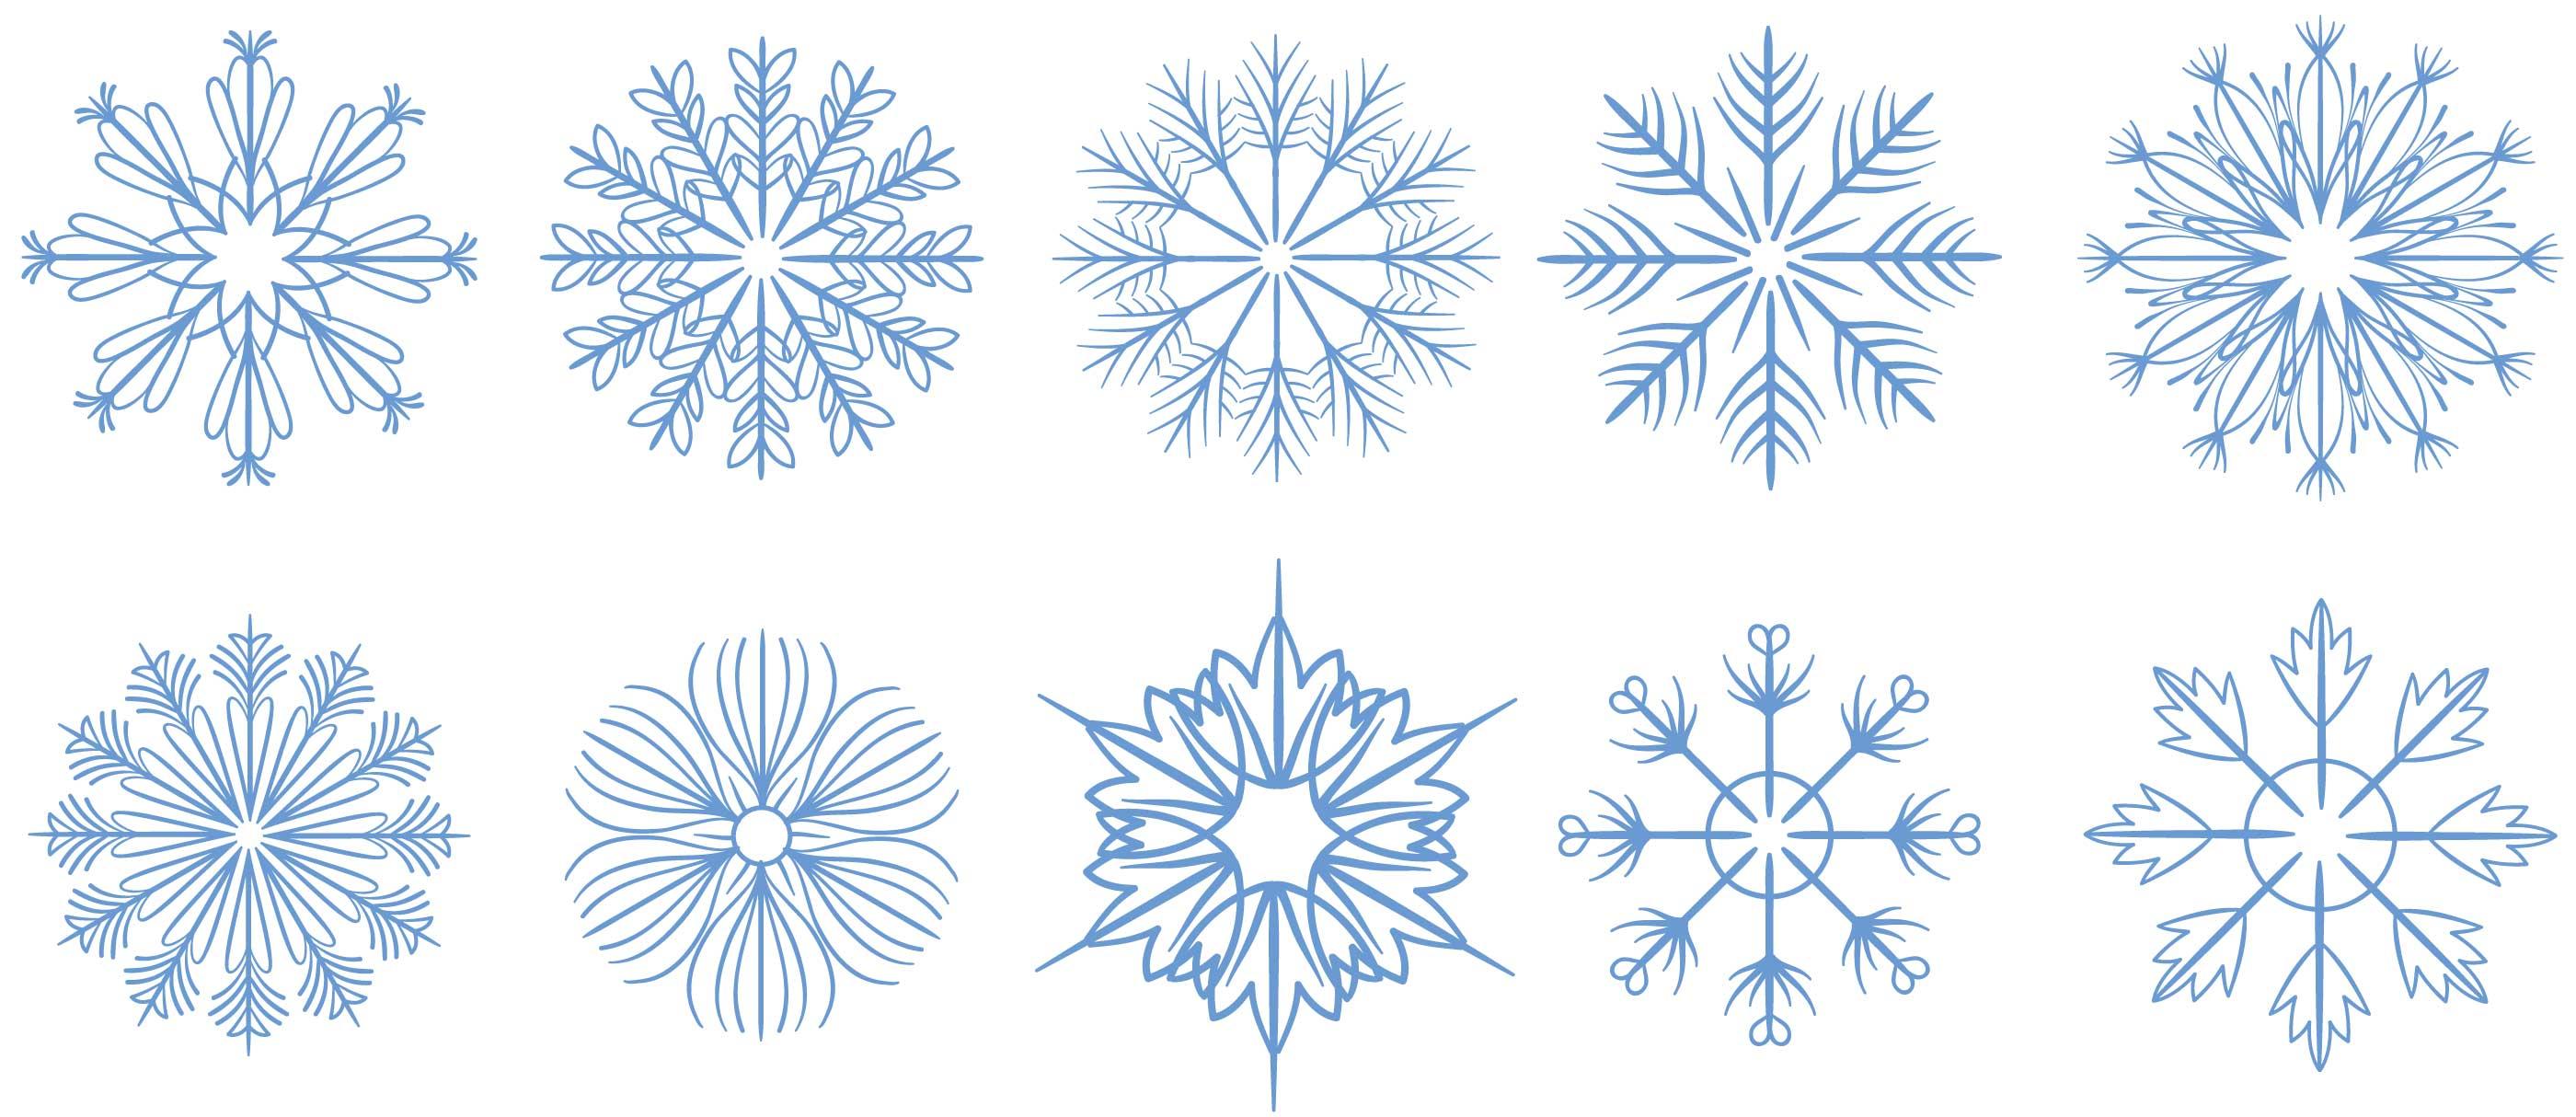 Free Snowflakes 2 Vectors